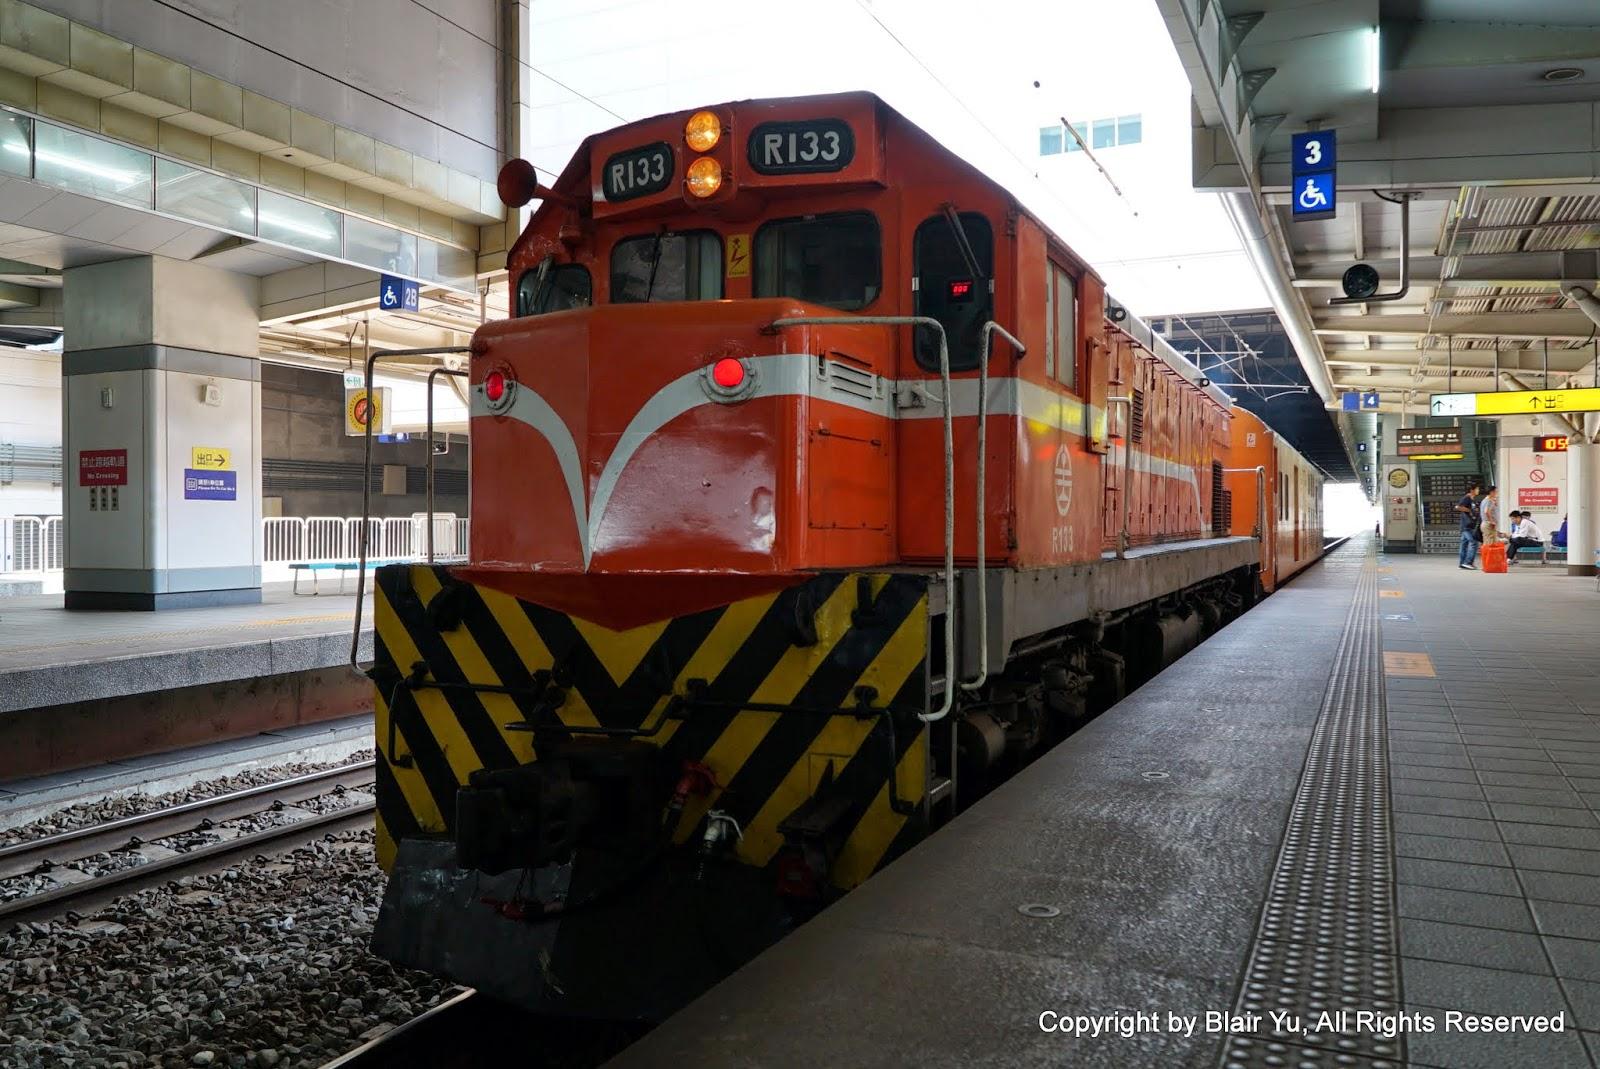 Blair's 鐵道攝影: R133柴電機車 / TRA R133 Diesel-electric Locomotive